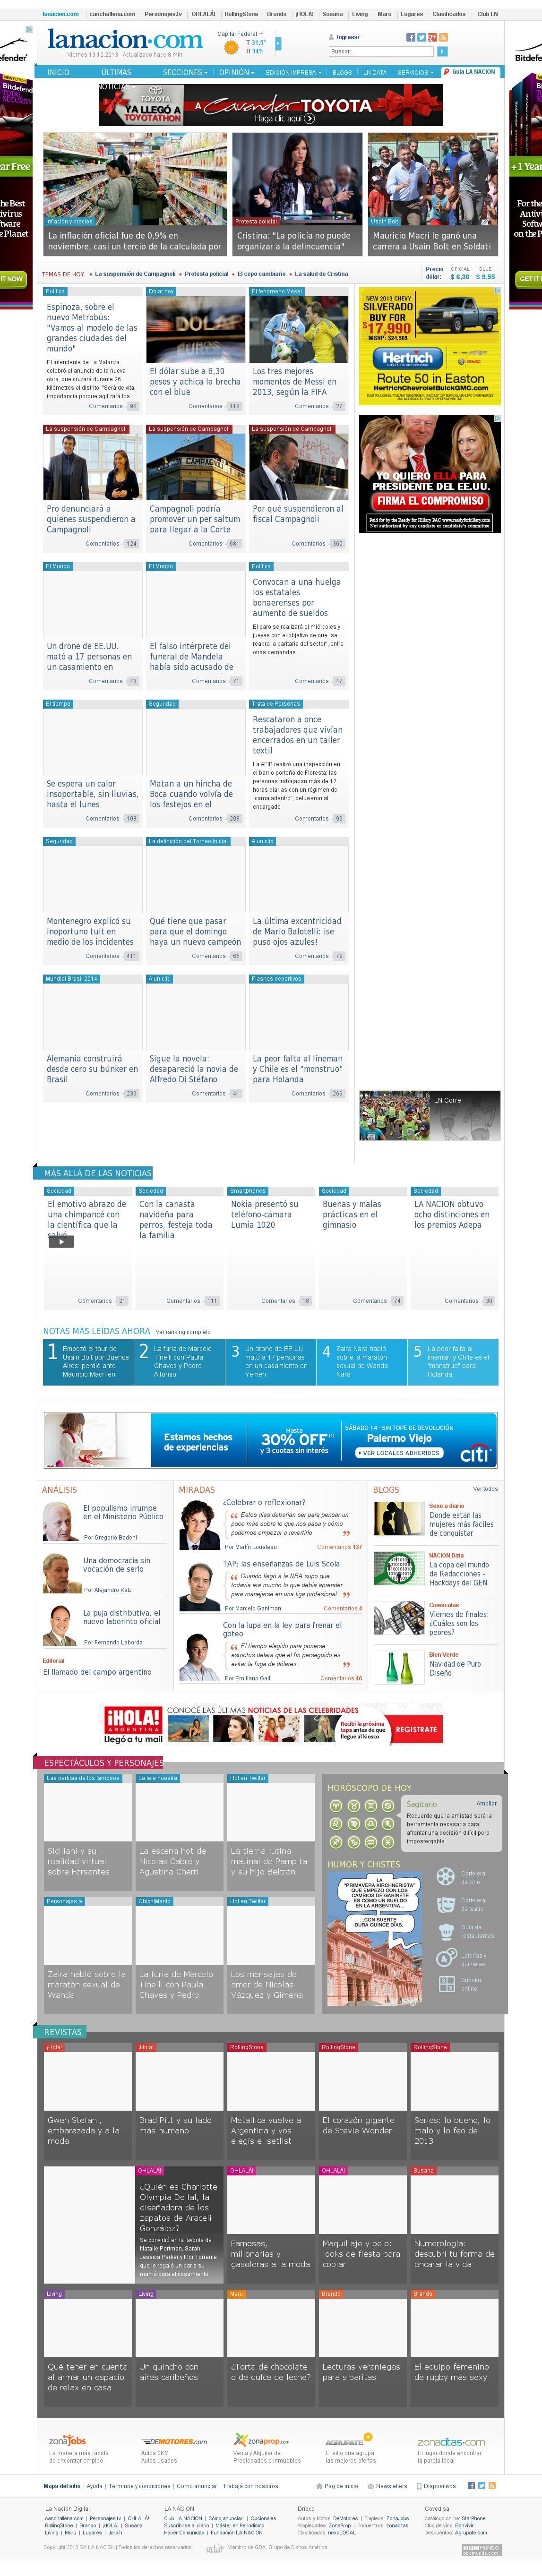 lanacion.com at Friday Dec. 13, 2013, 9:10 p.m. UTC